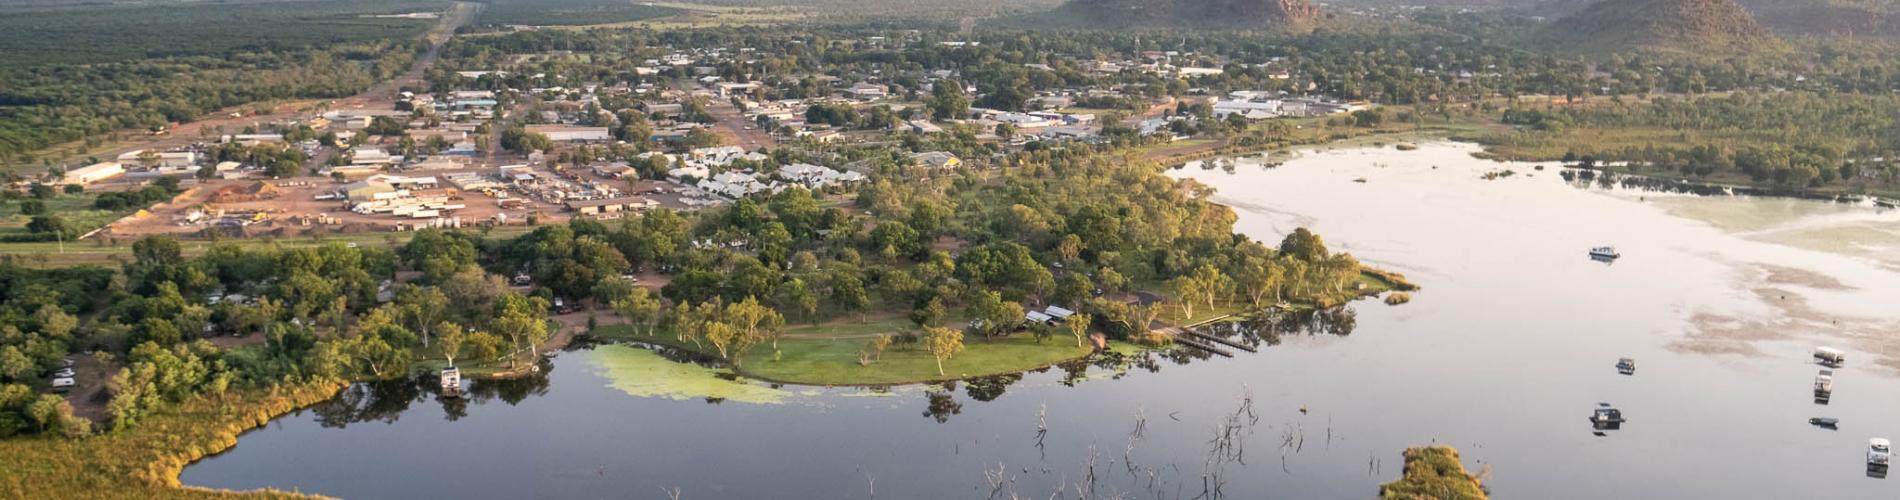 Kimberleyland with Kununurra in the background